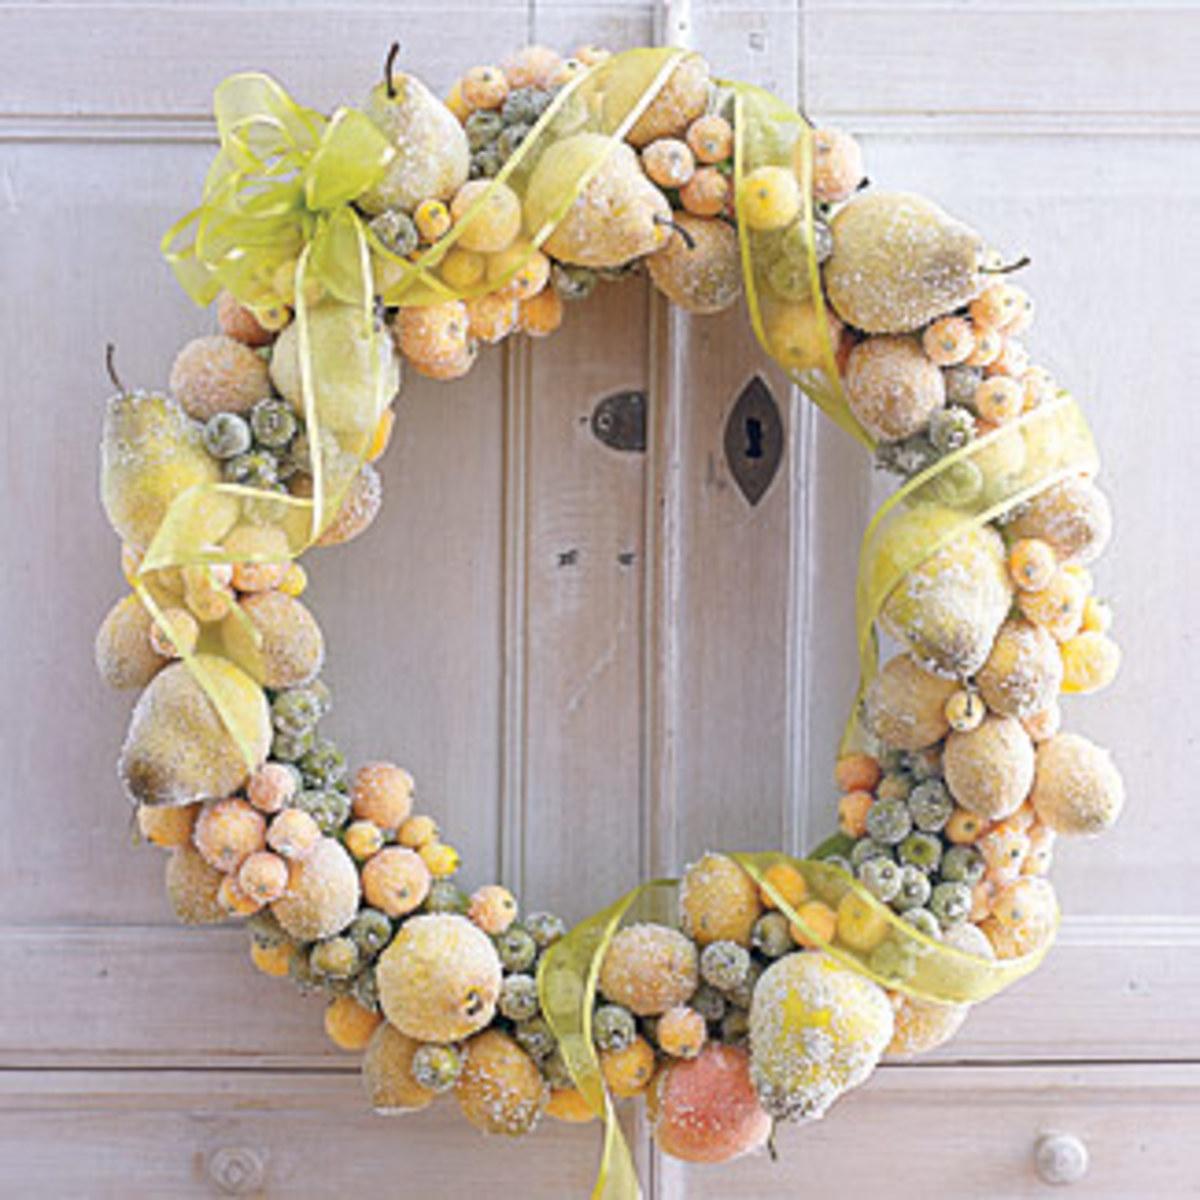 Sugar coated Christmas Wreath goodhousekeeping.com